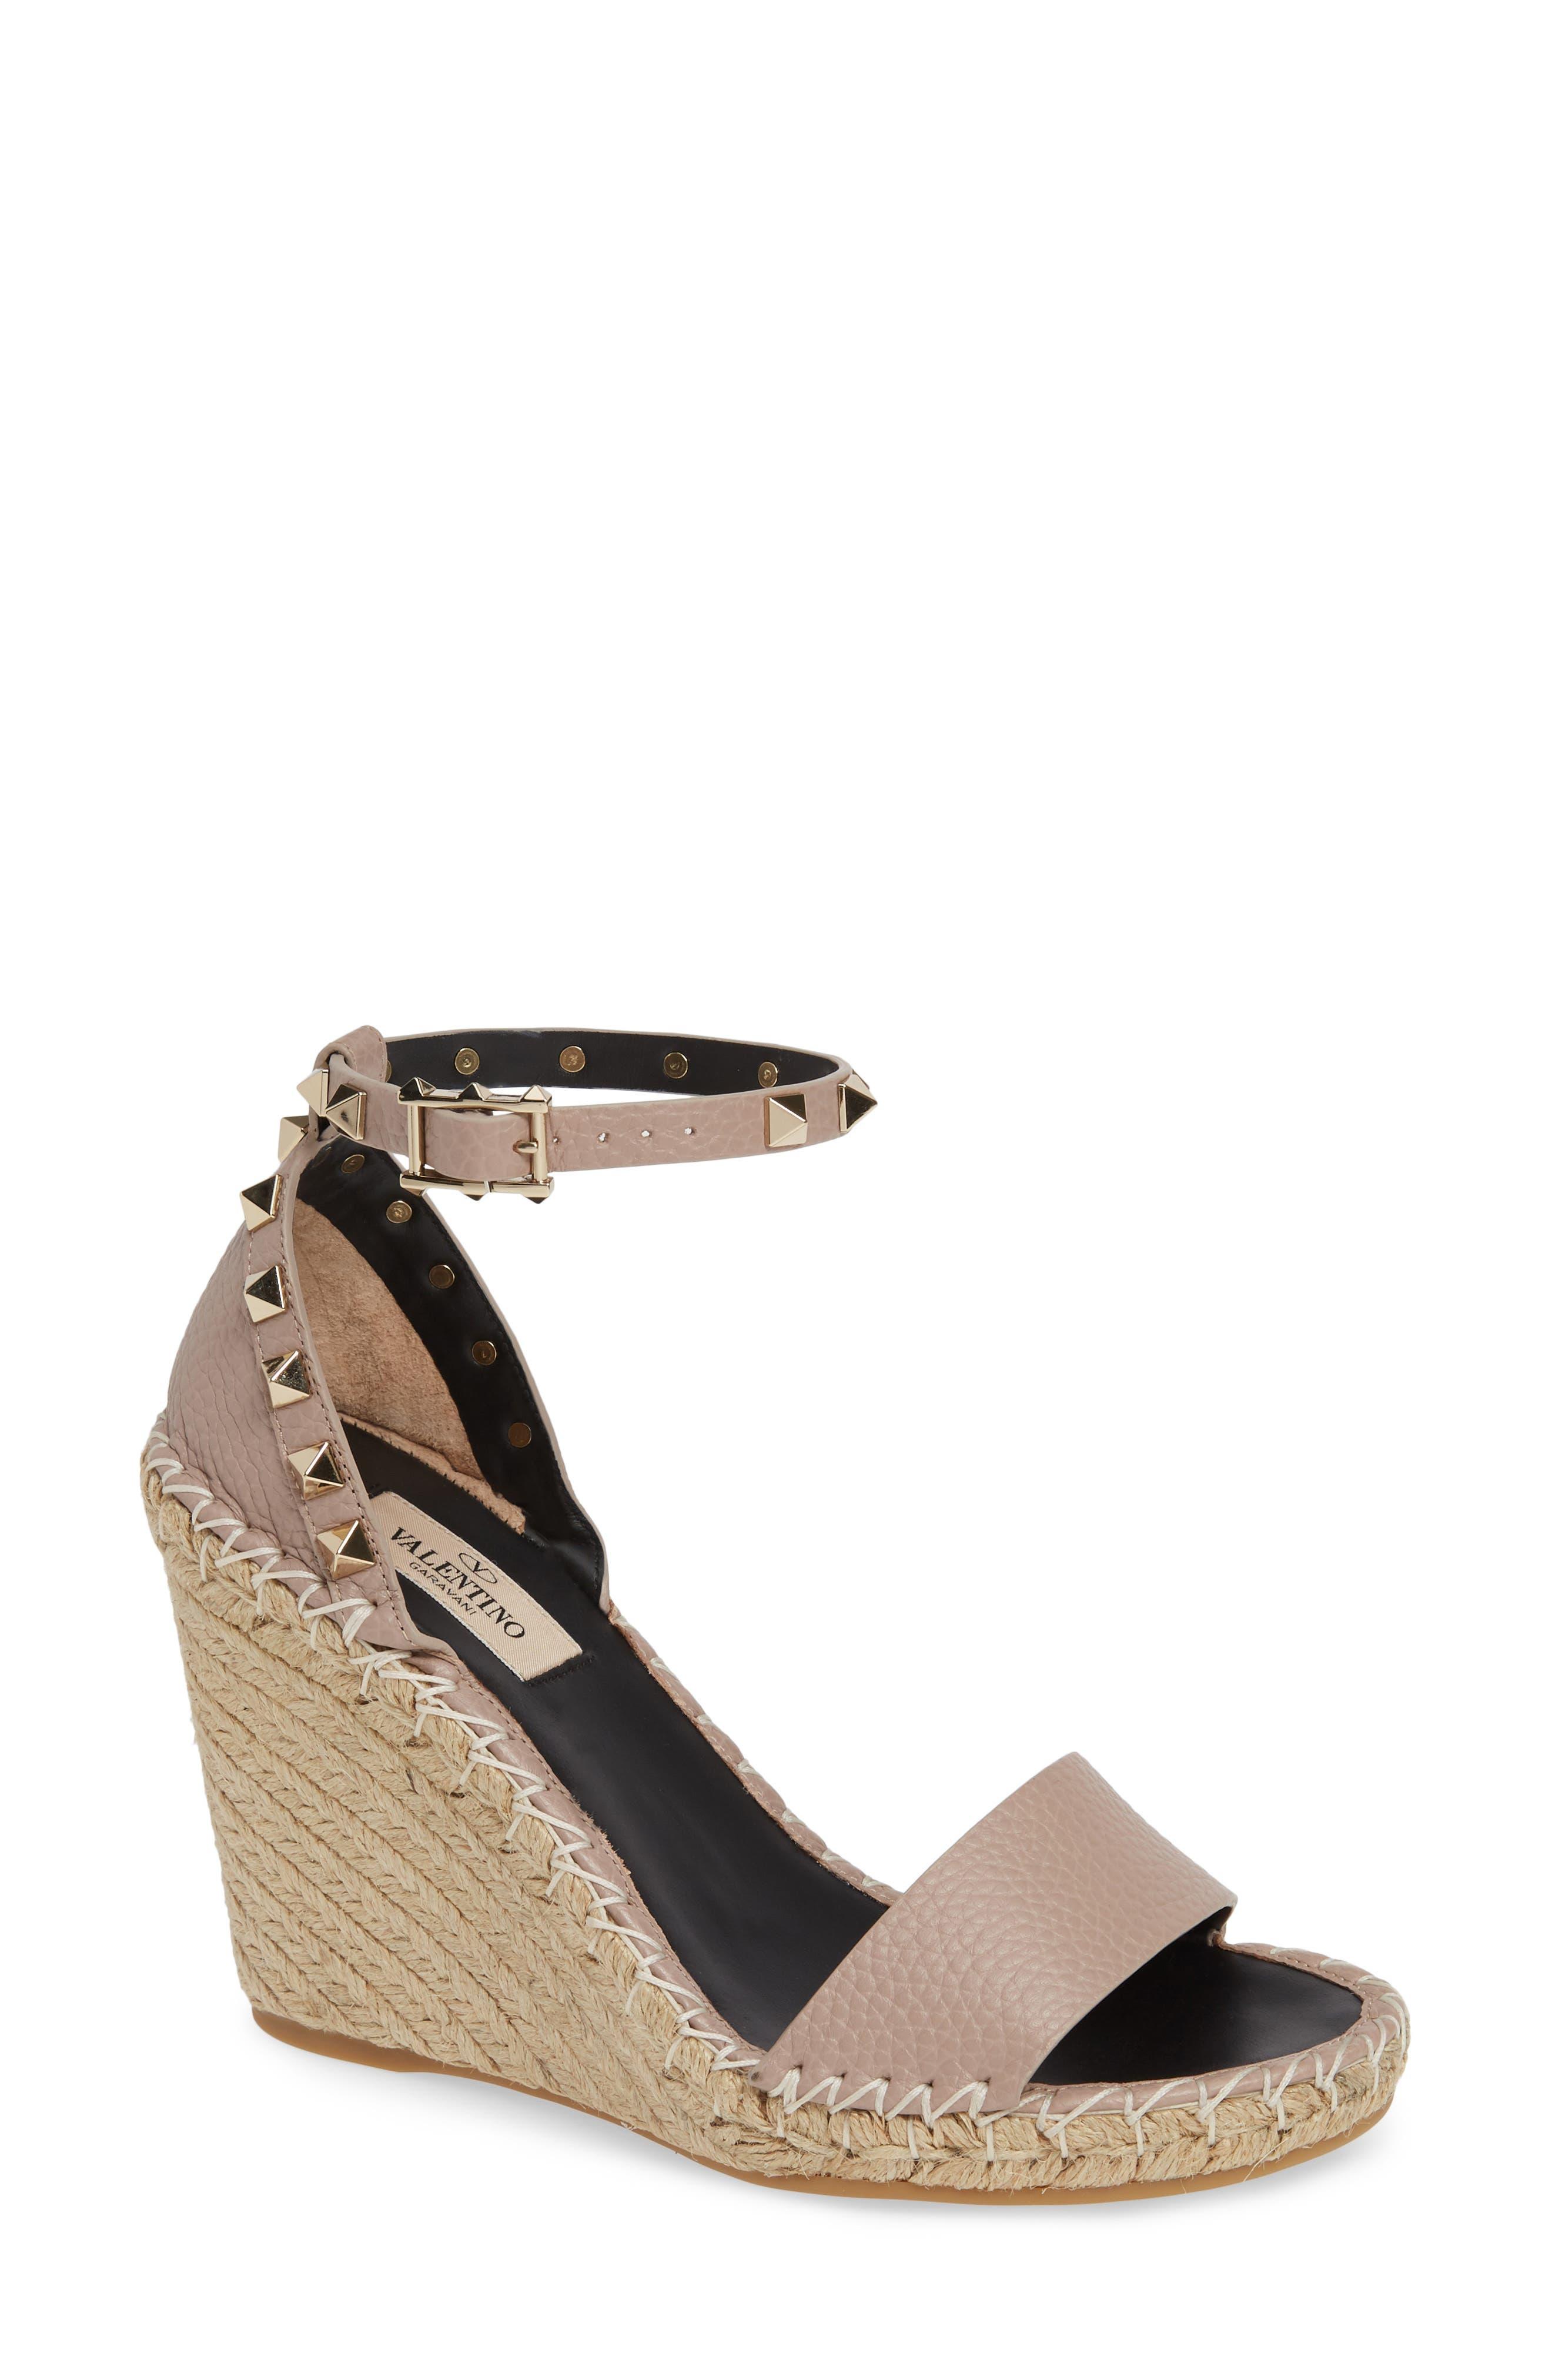 aa8e6eb81db5 Women s VALENTINO GARAVANI Wedge Sandals